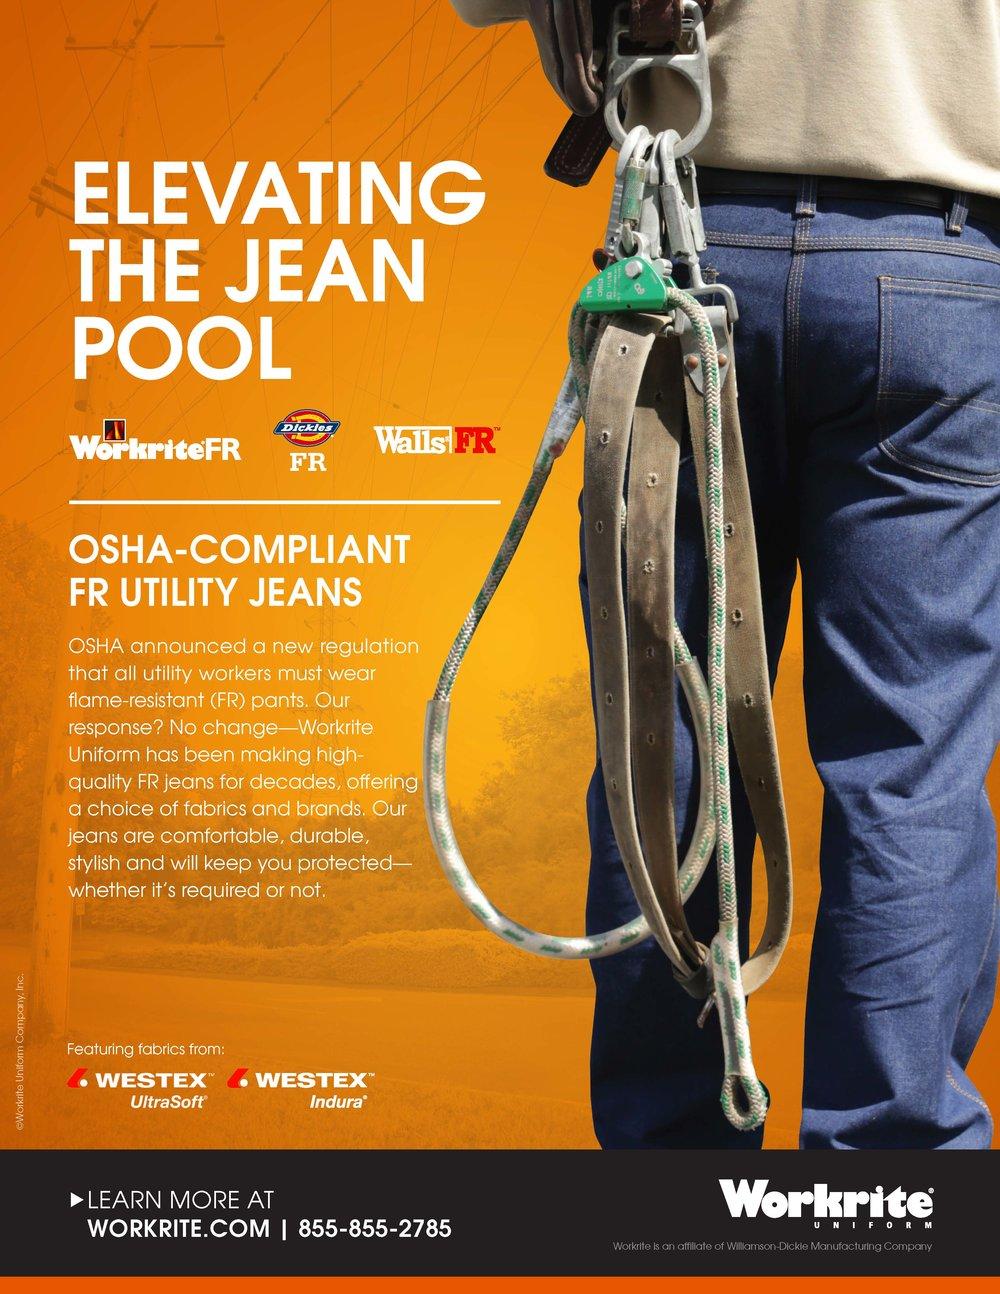 Workrite jeans ad.jpg